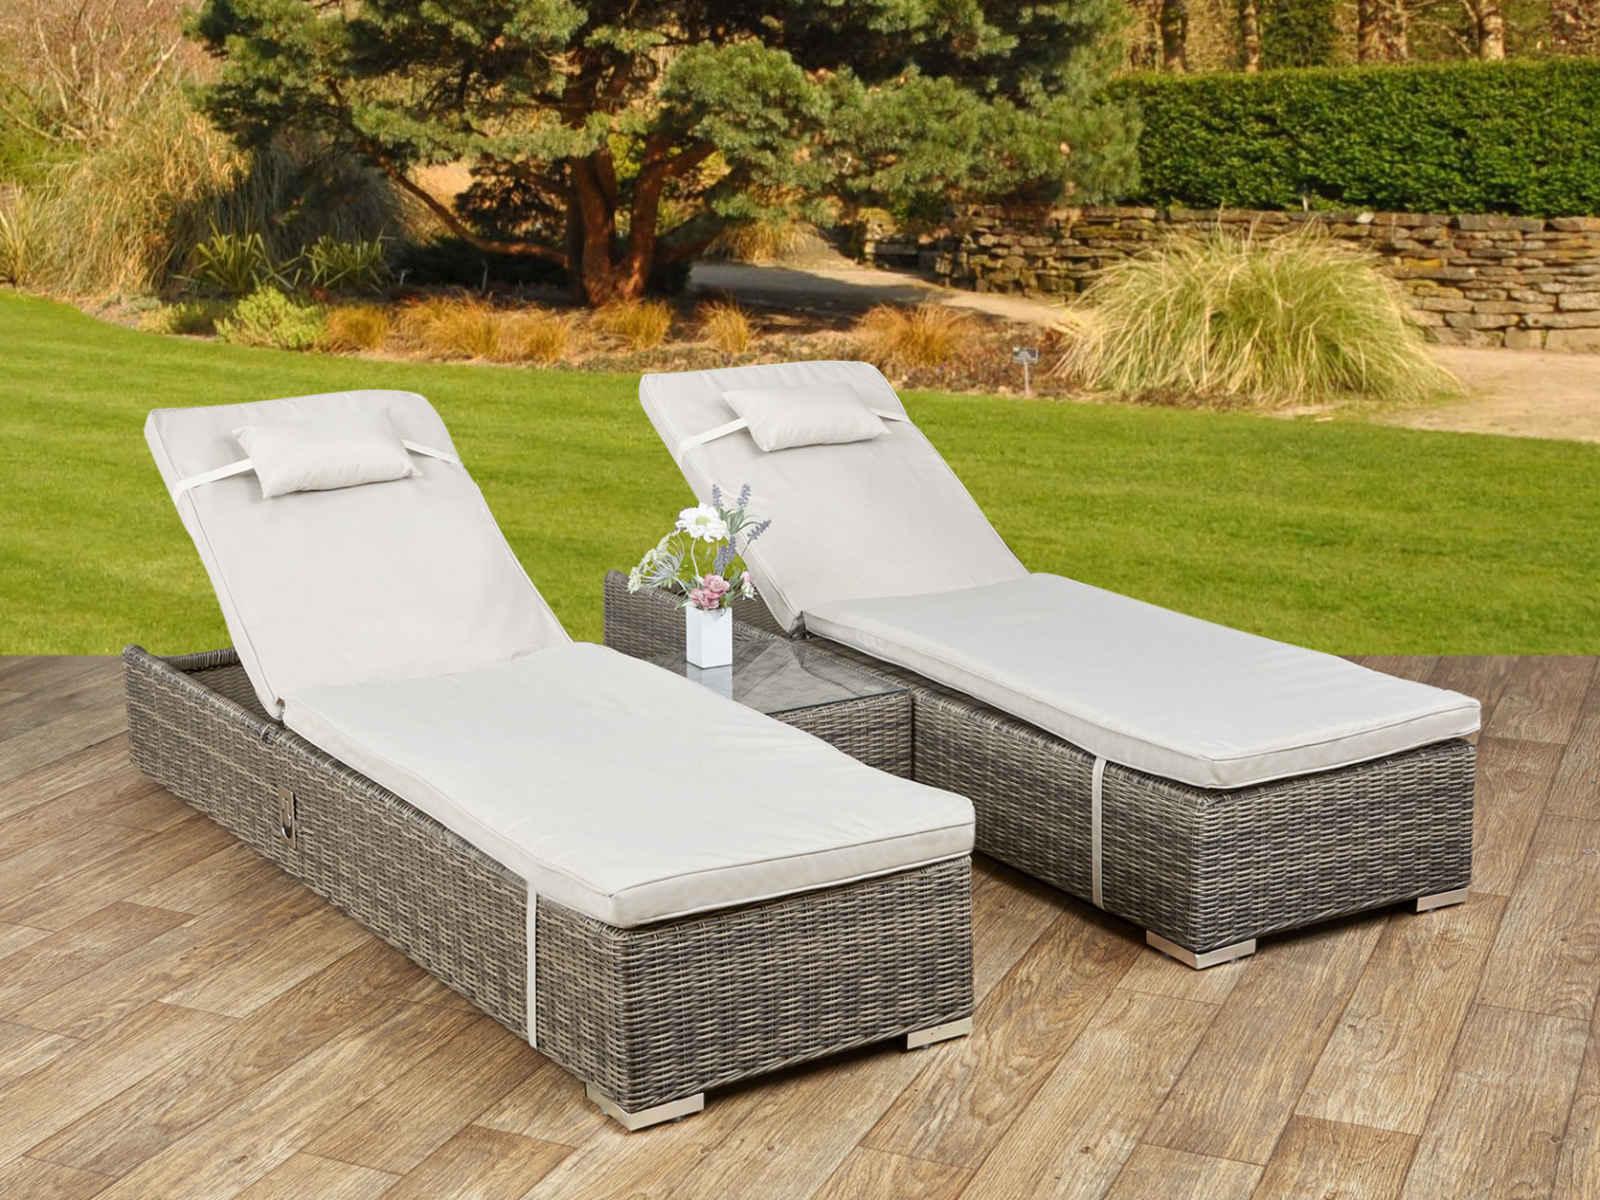 Tips For Choosing A Garden Lounger 3